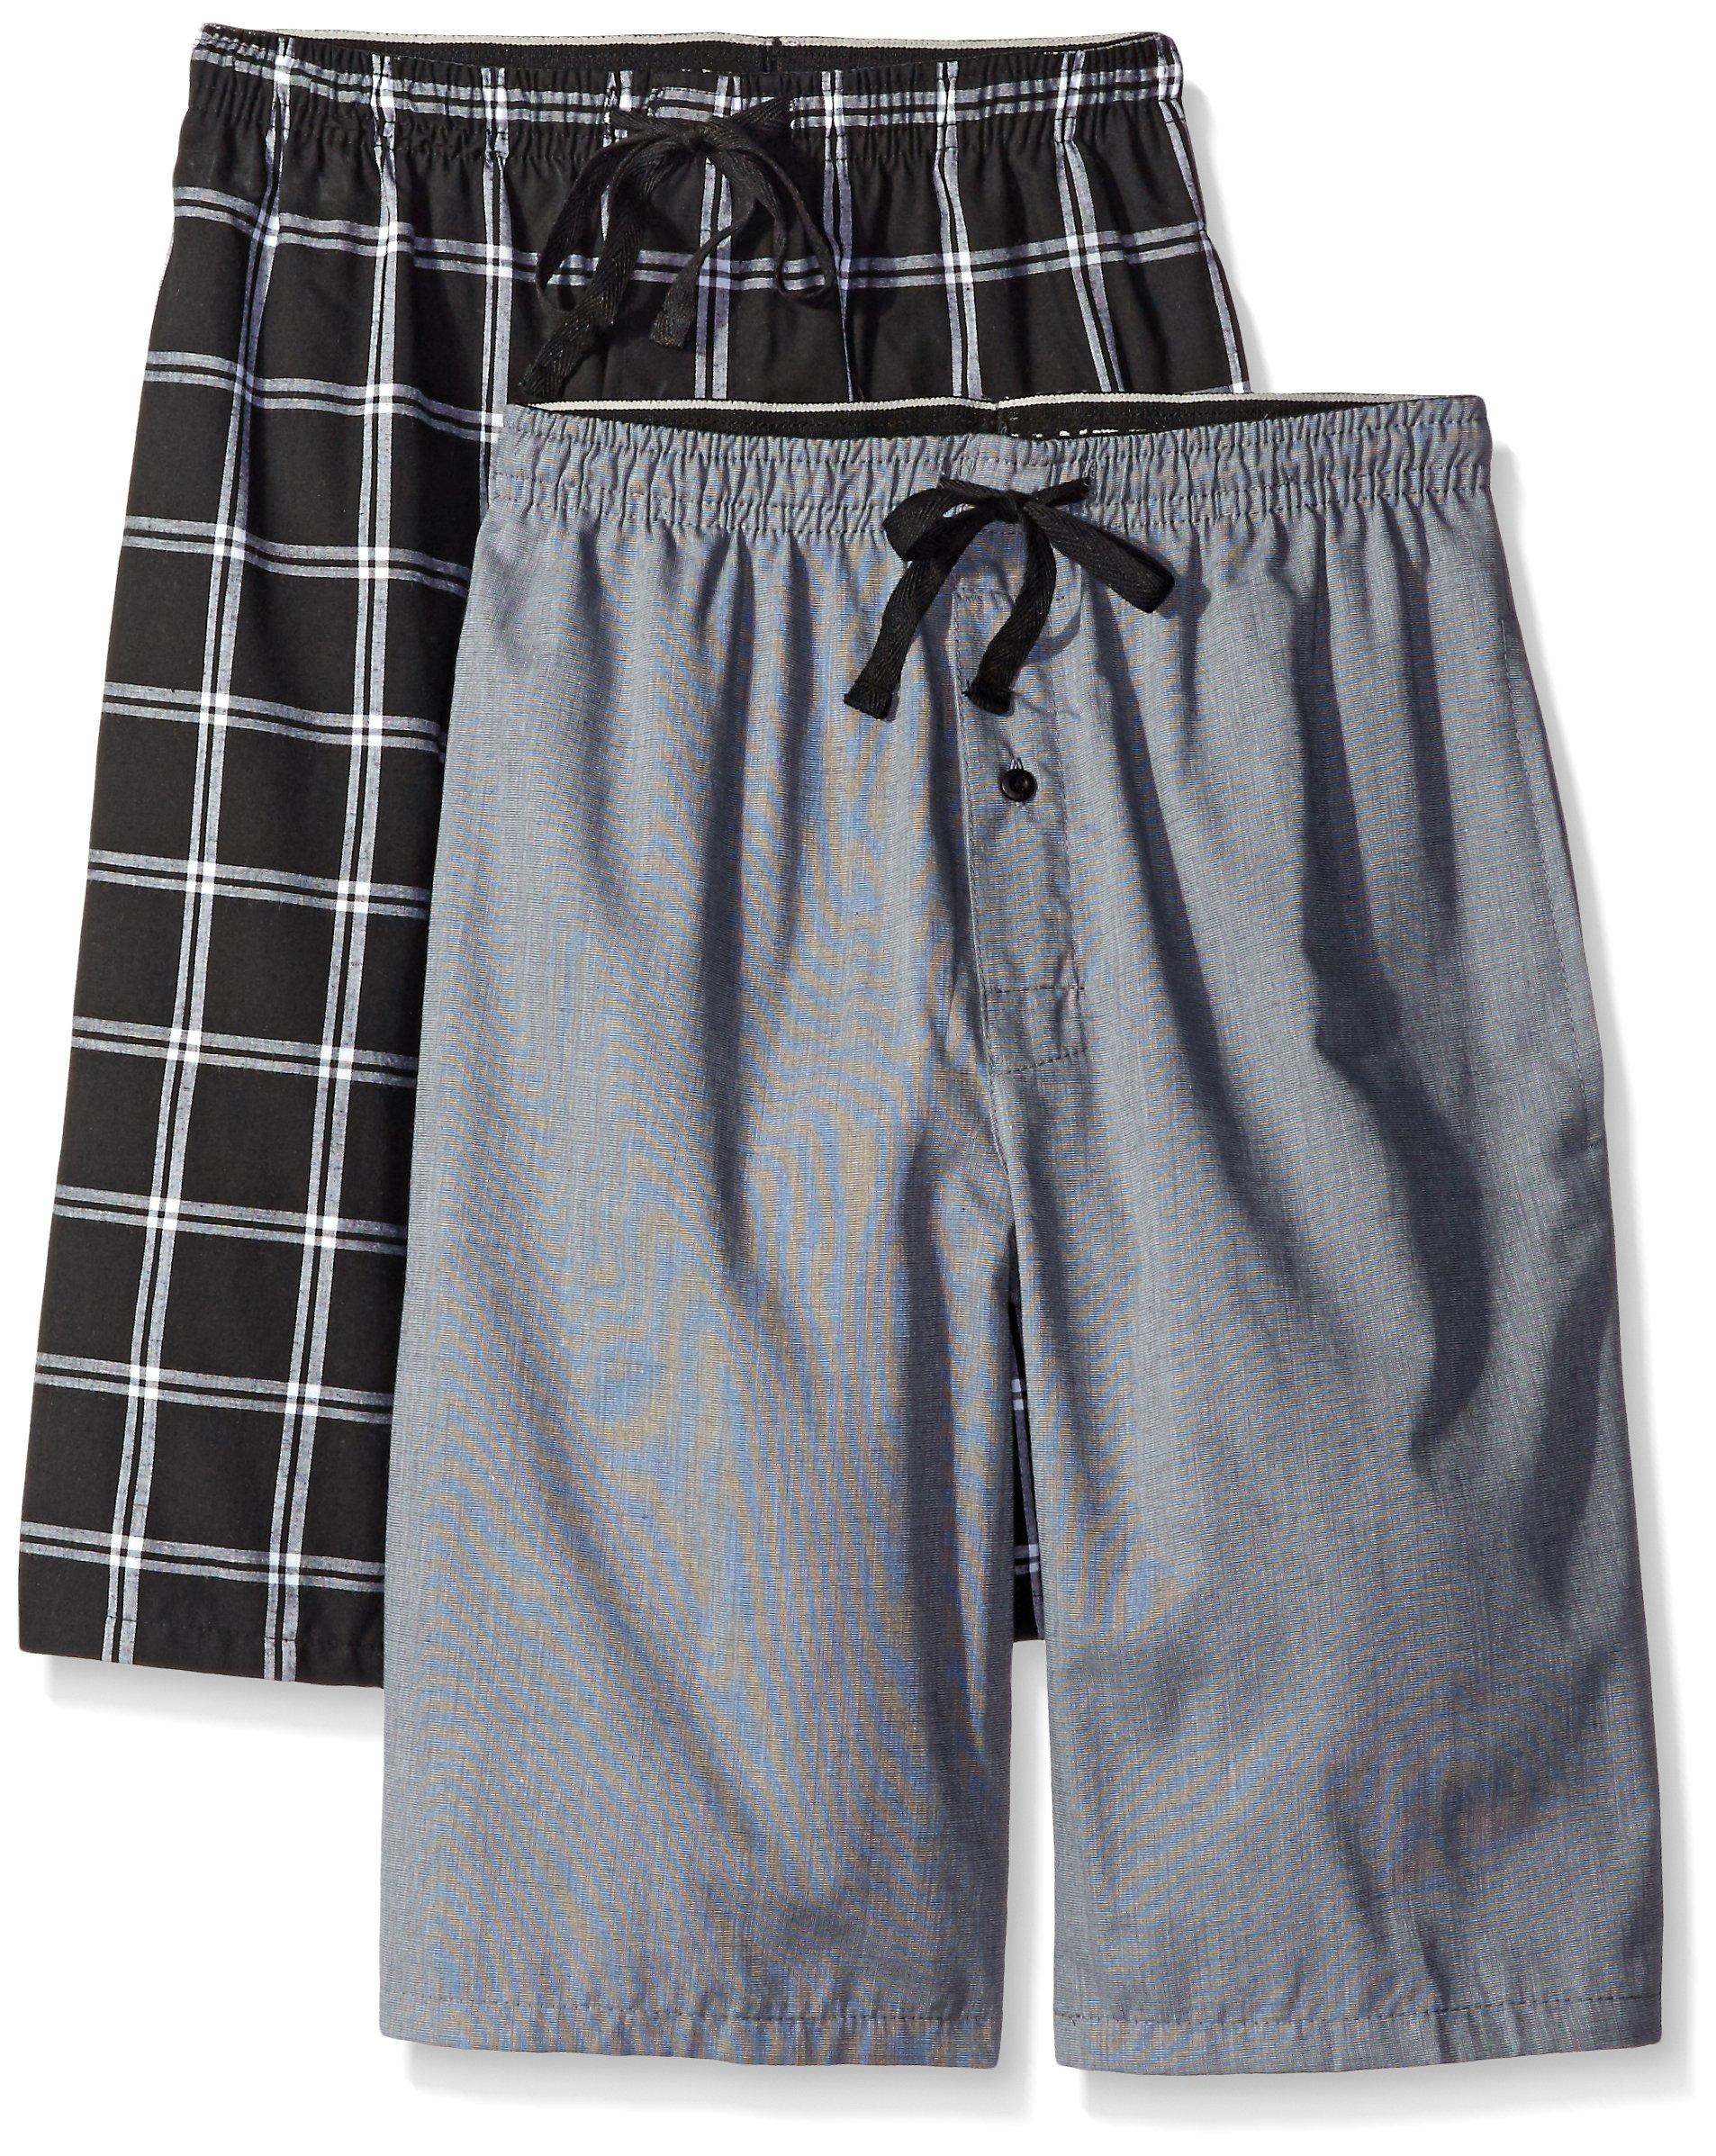 Hanes Men's 2-Pack Woven Pajama Short, Black/Grey, XX-Large